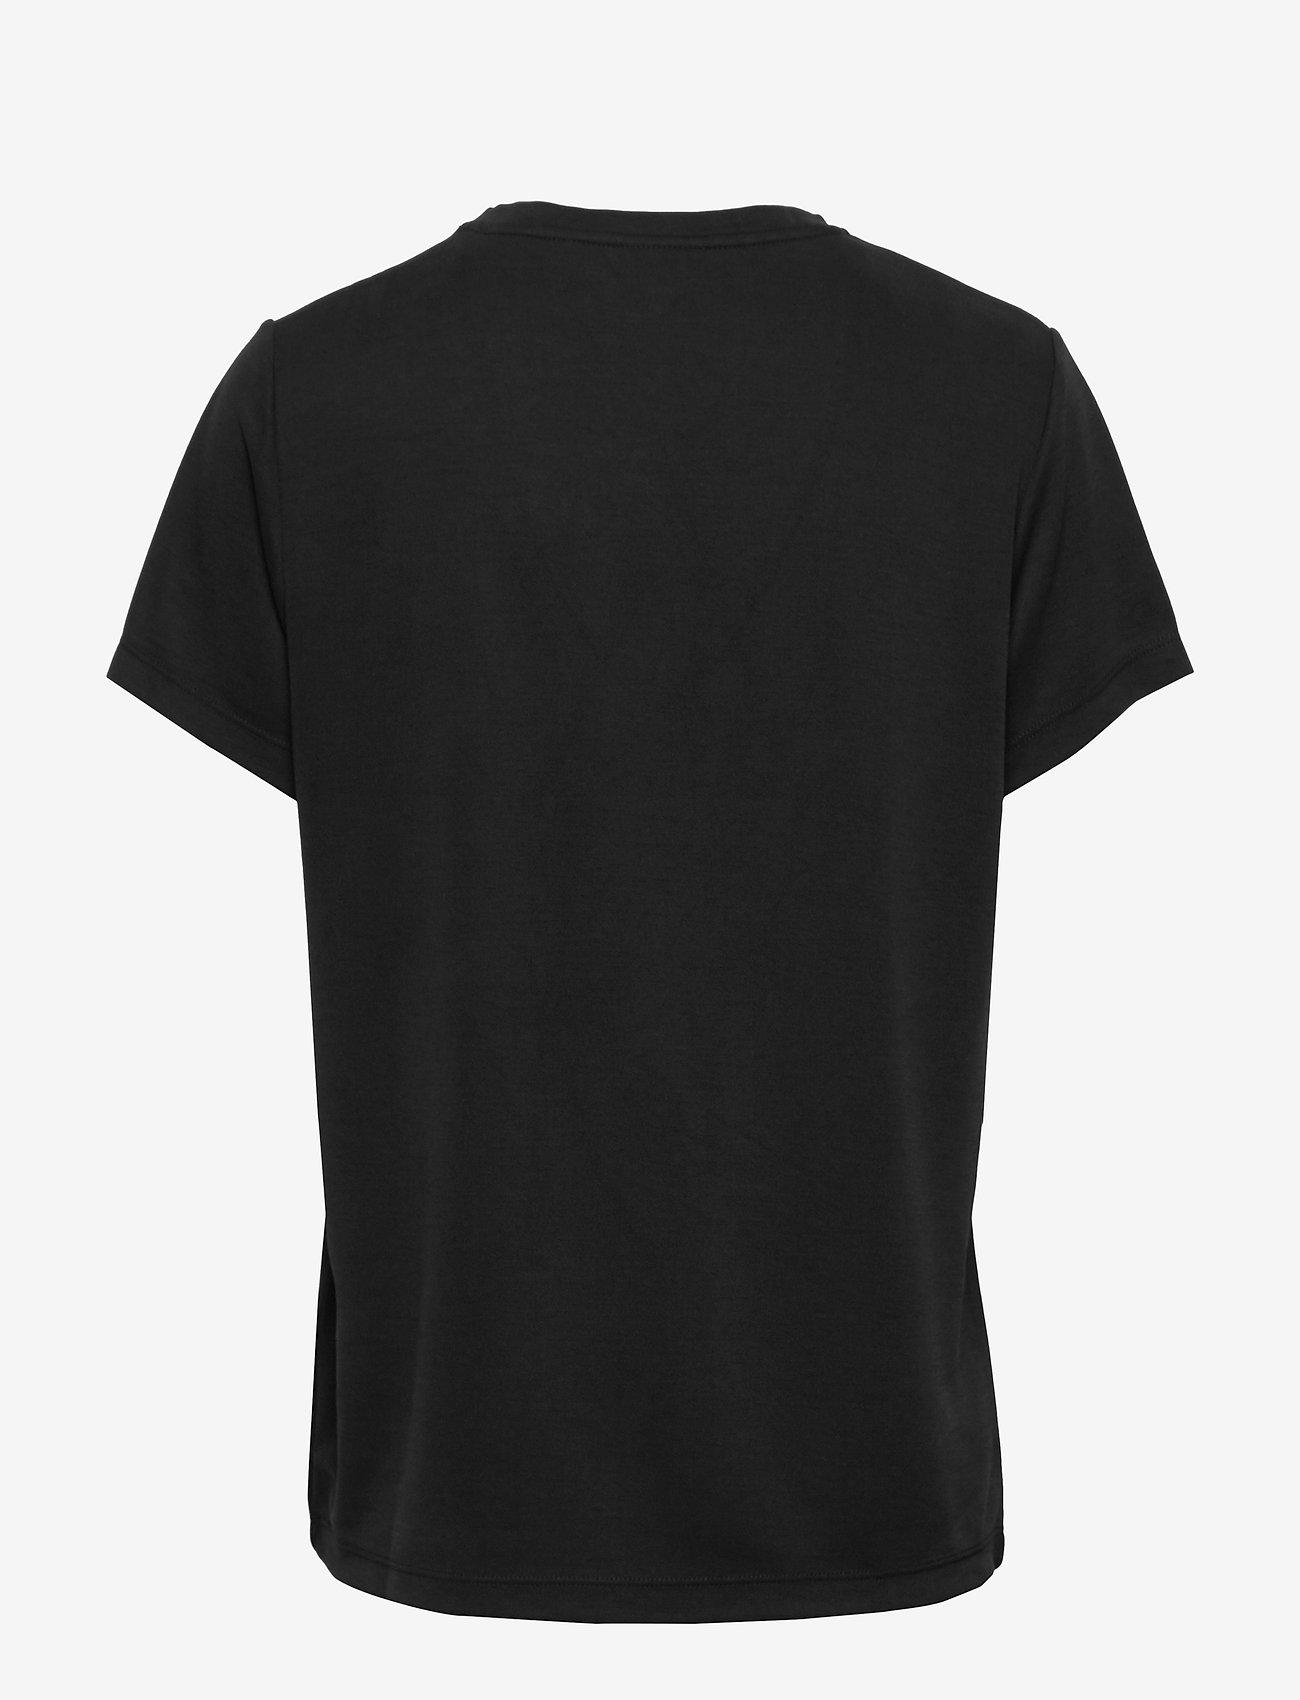 2NDDAY - 2ND Serena - t-shirts - black - 1